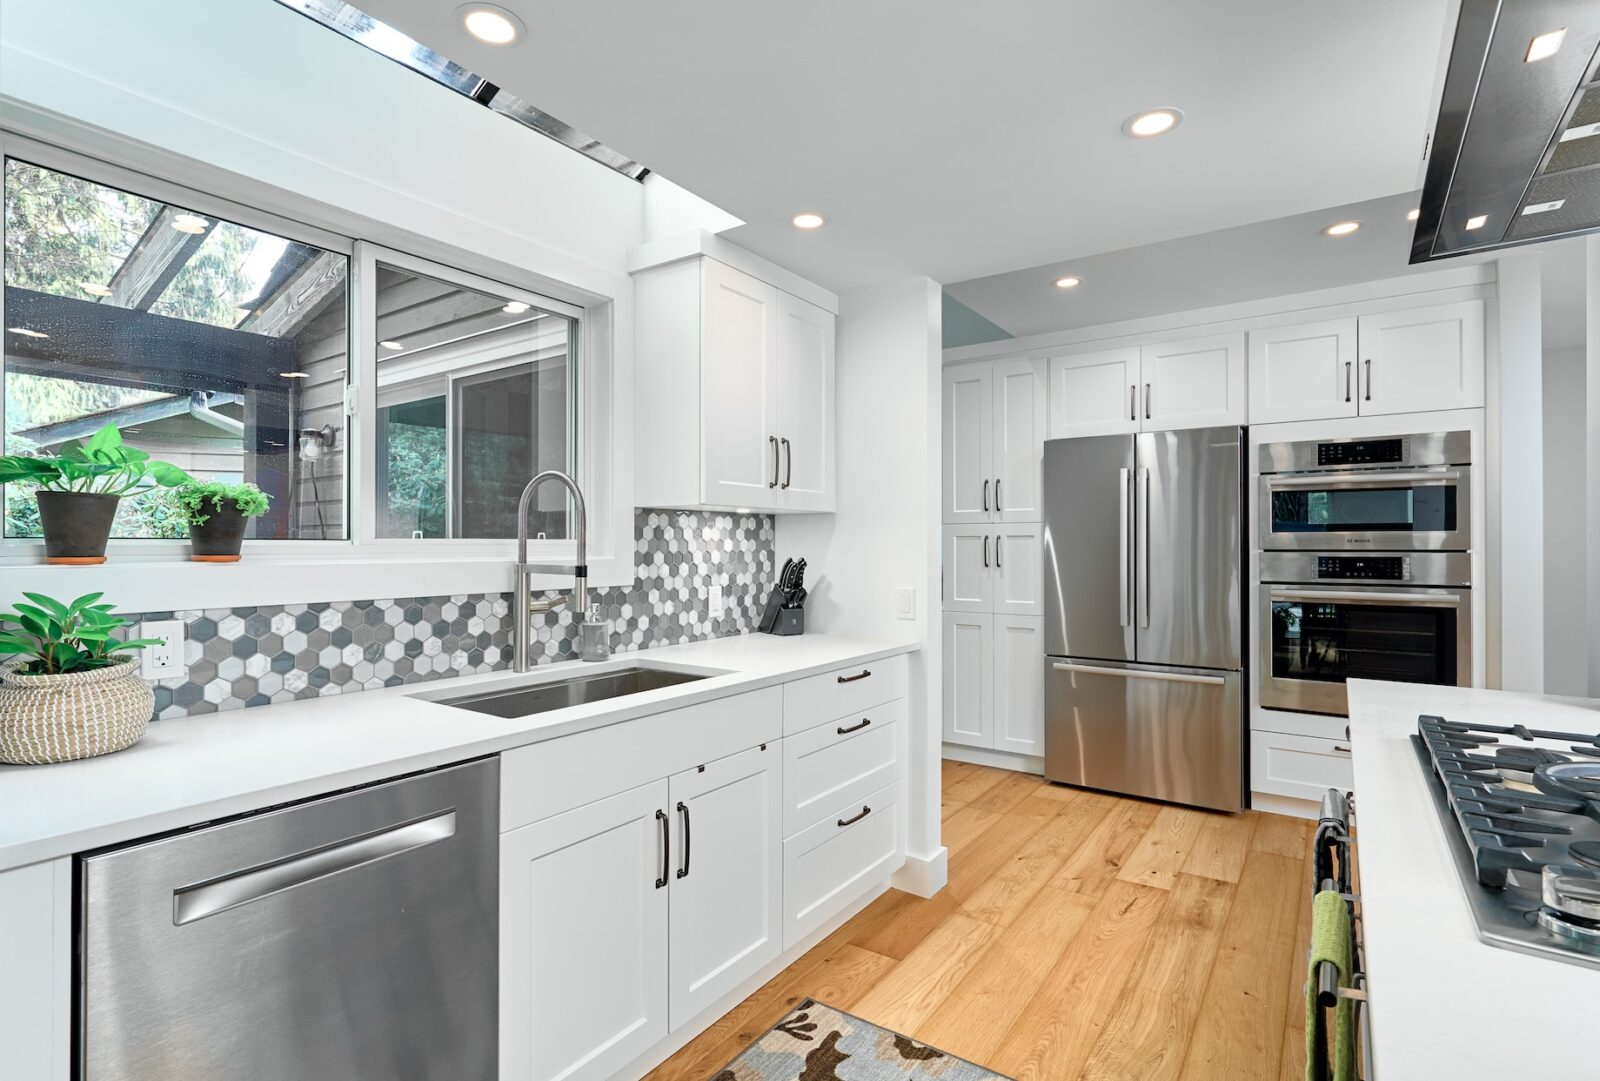 Custom Home Renovation Starts in the Spring